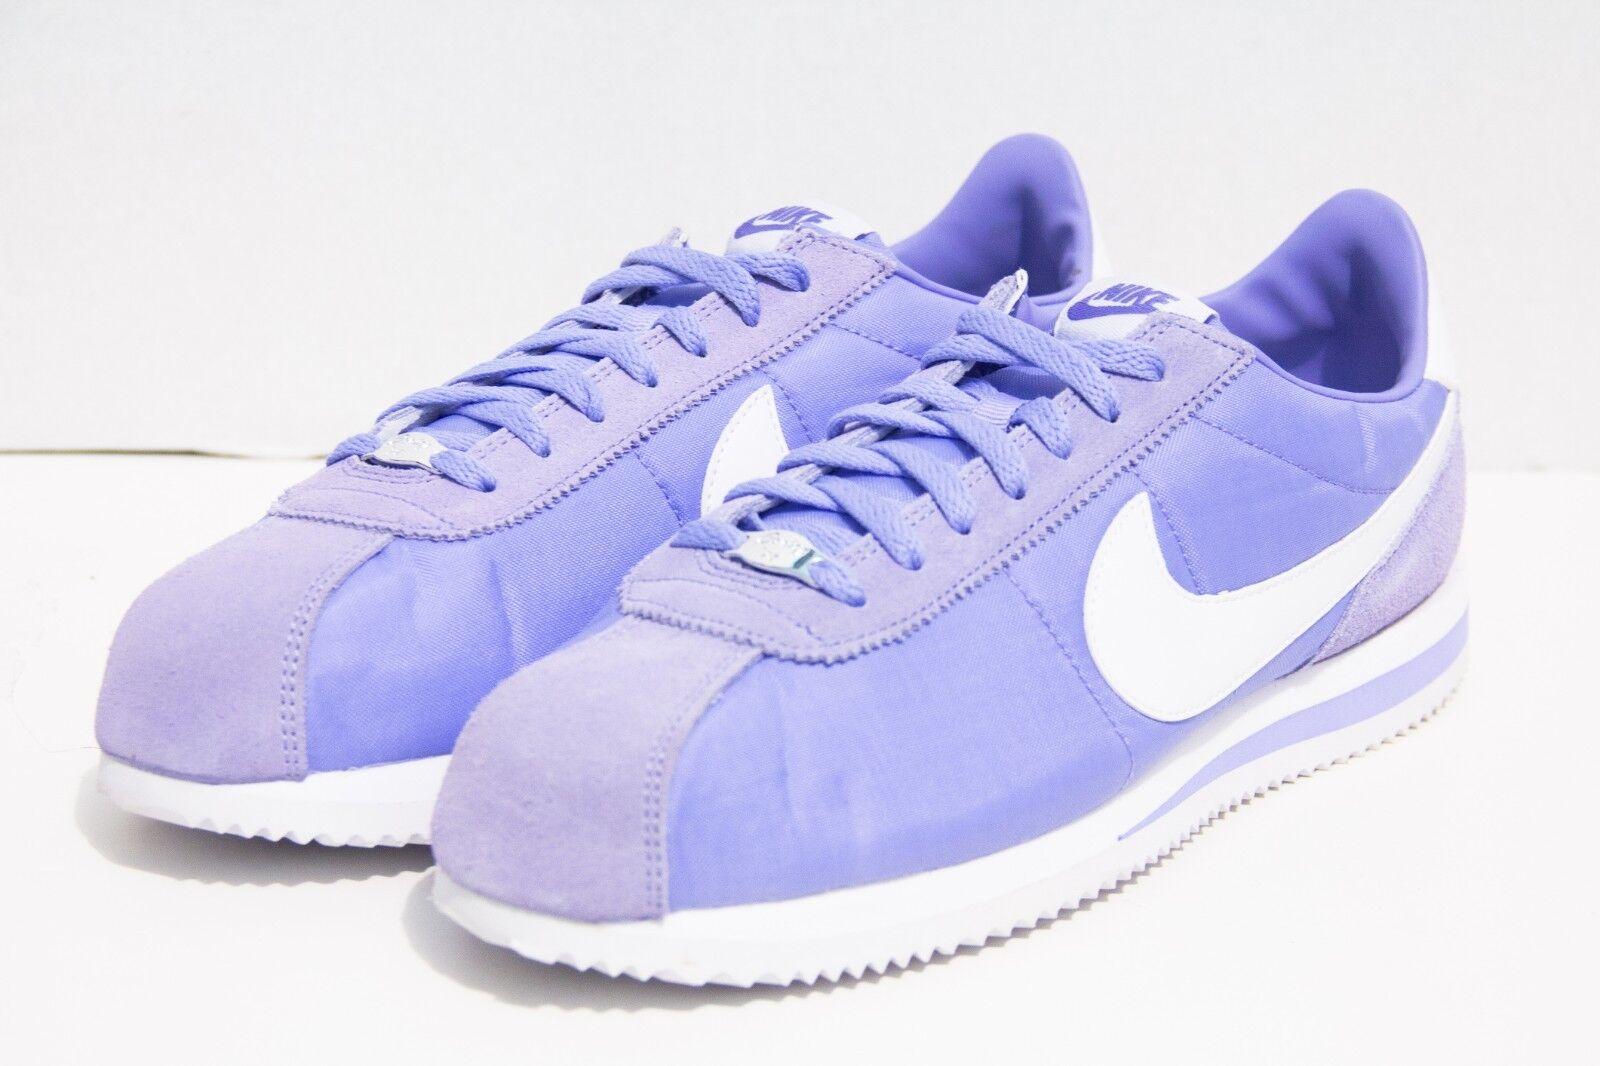 Nike Men's Cortez Basic SE Size 11.5 Twilight Pulse White Purple shoes AT4650 400